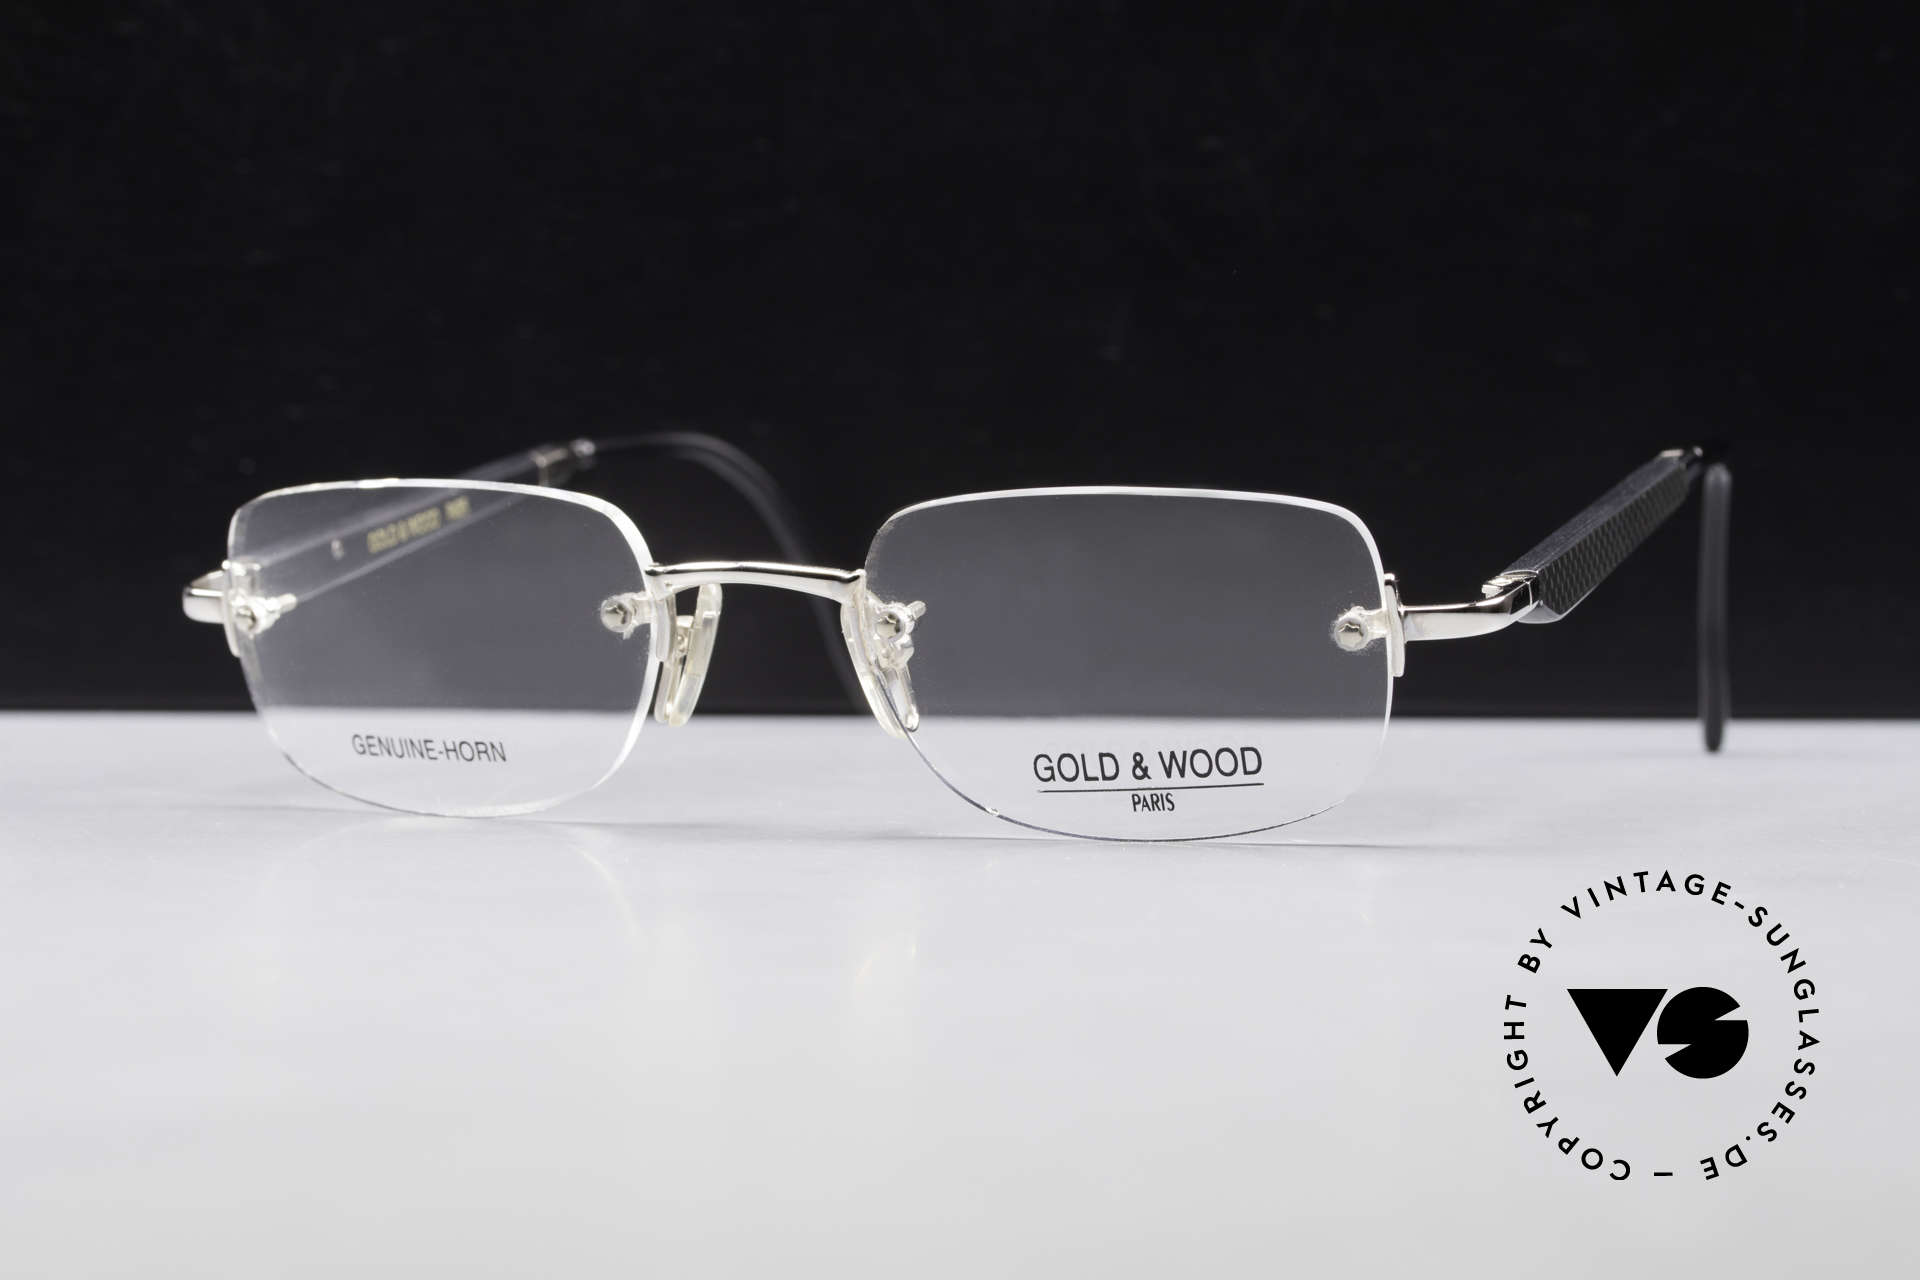 Gold & Wood 332 Genuine Horn Rimless Glasses, the credo: elegance, timelessness, craftsmanship, Made for Men and Women